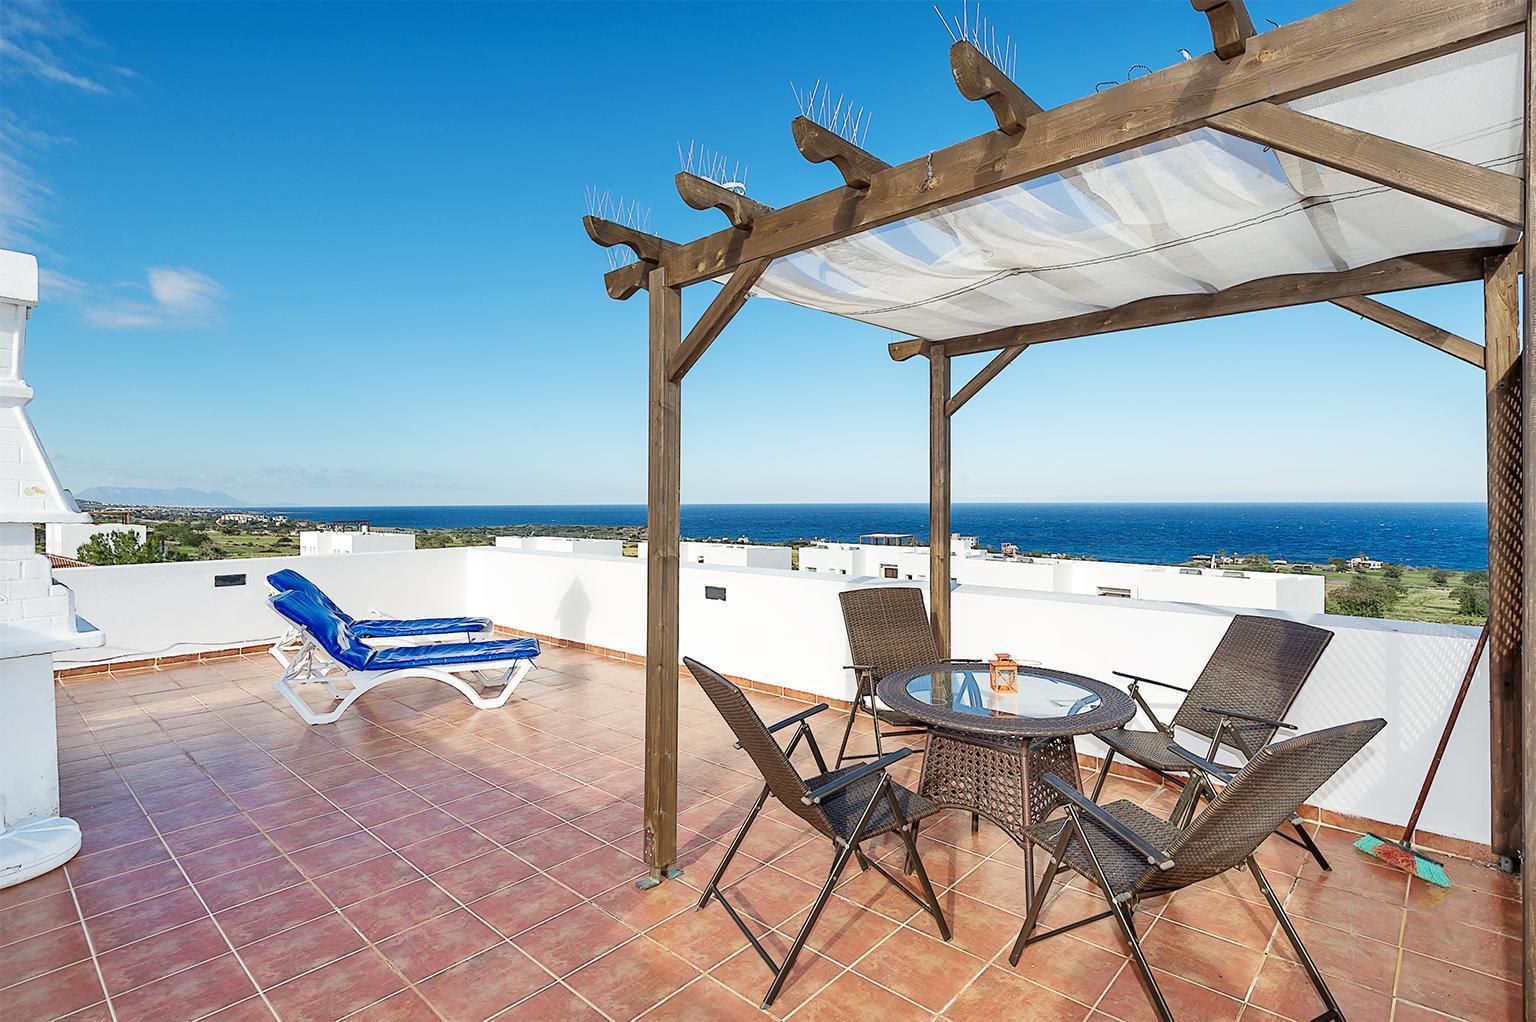 Review Joya Cyprus Mandarin Penthouse Lux Apartment